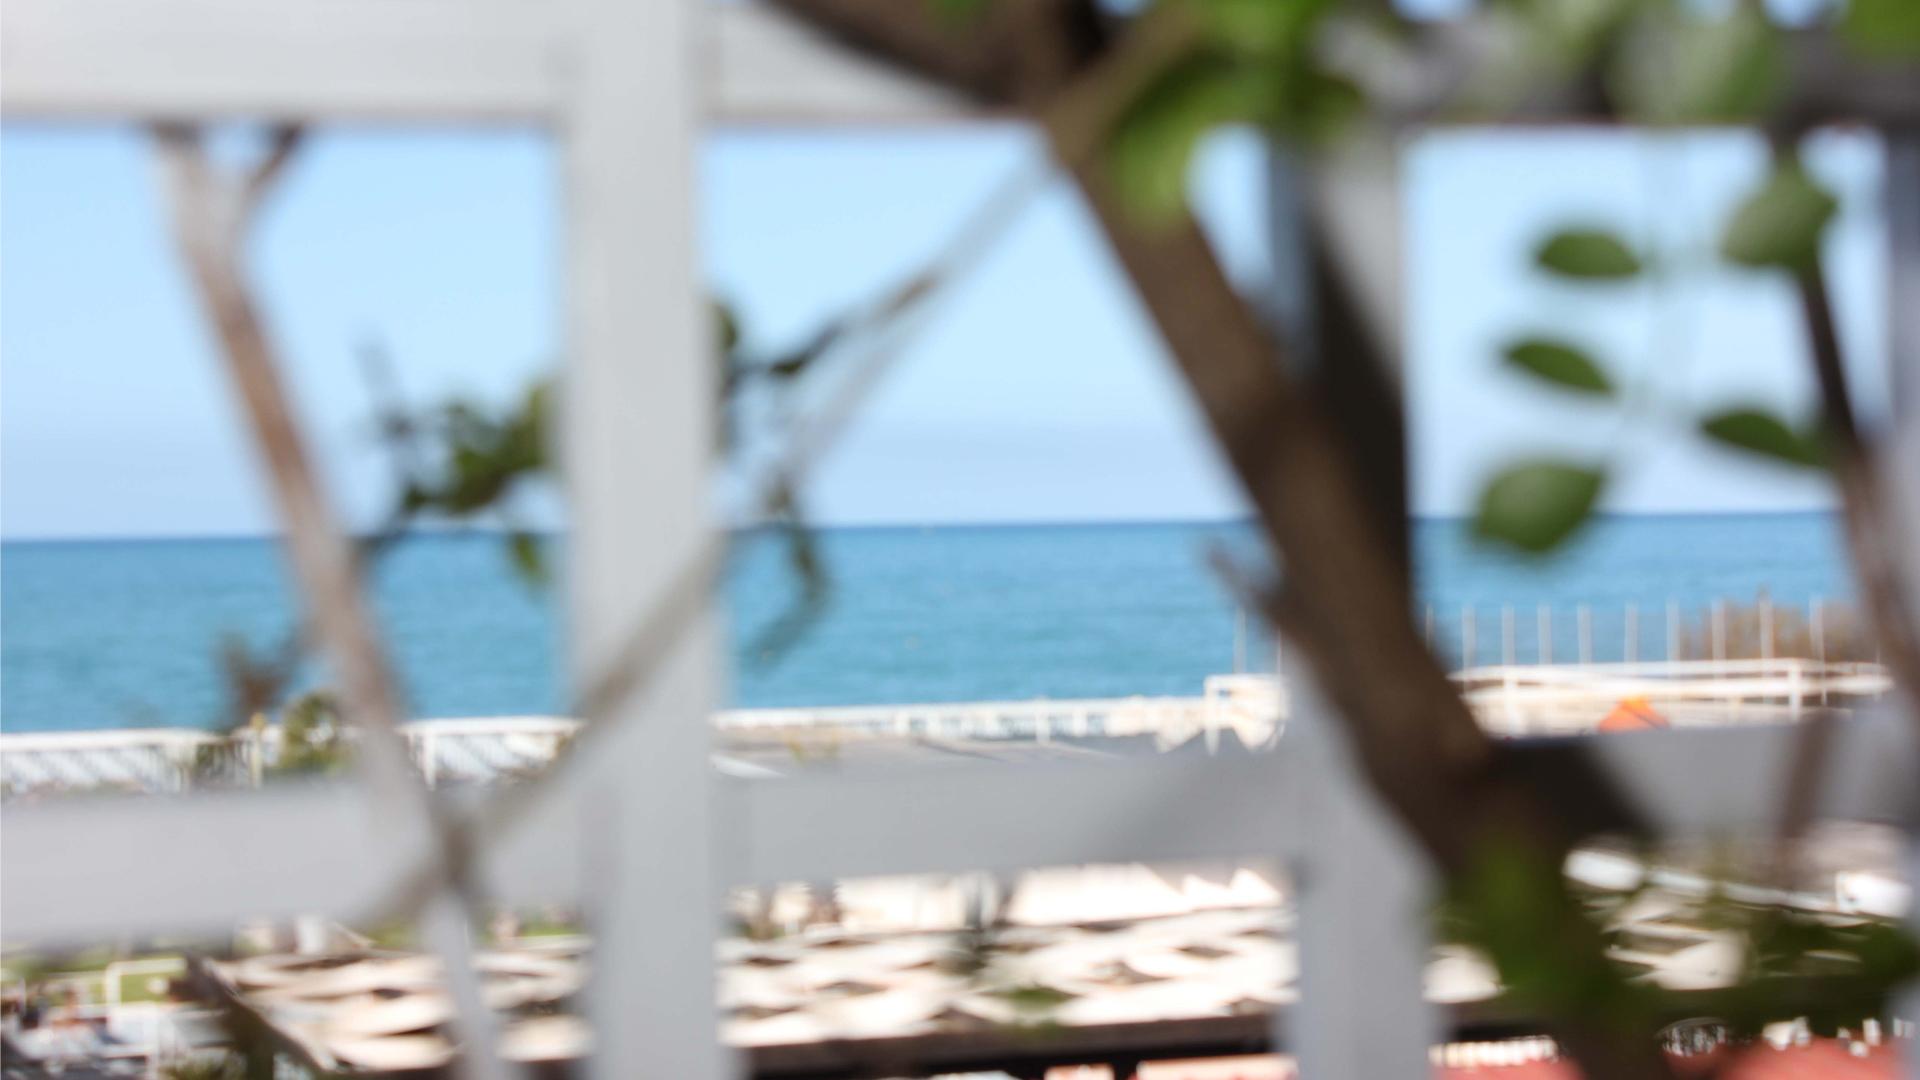 veranda-lounge-sul-mare-nettunoricevimenti-4